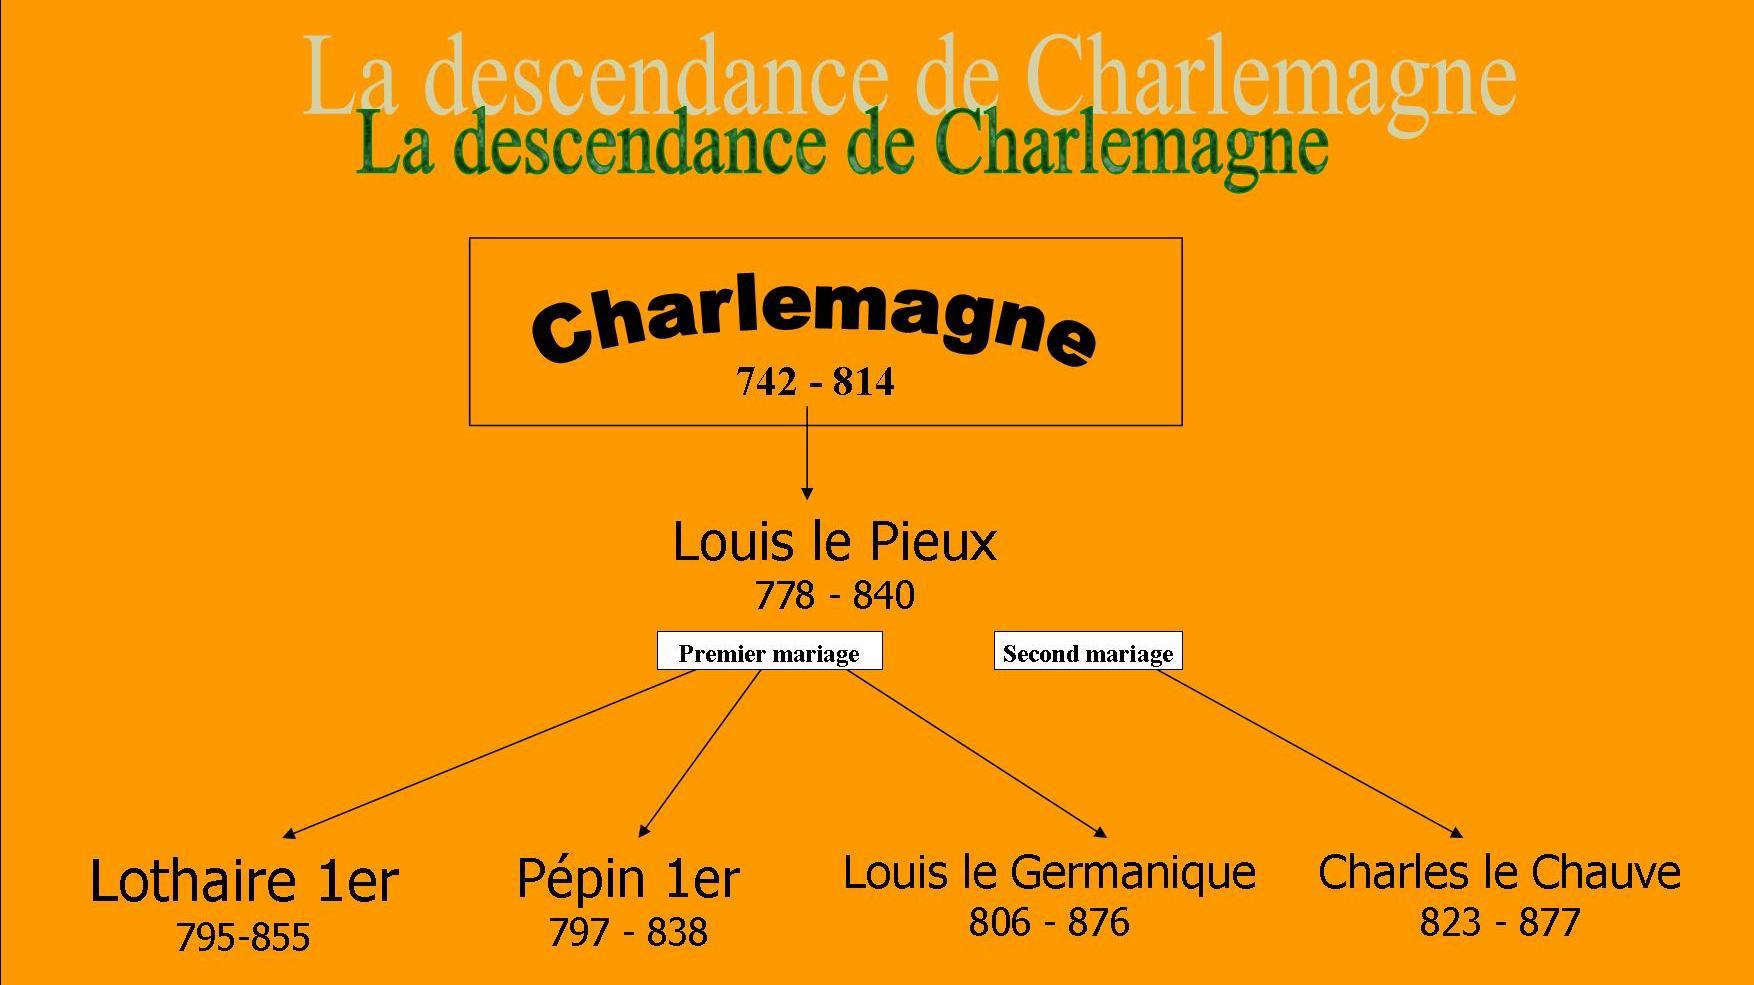 Généalogie de Charlemagne.jpg